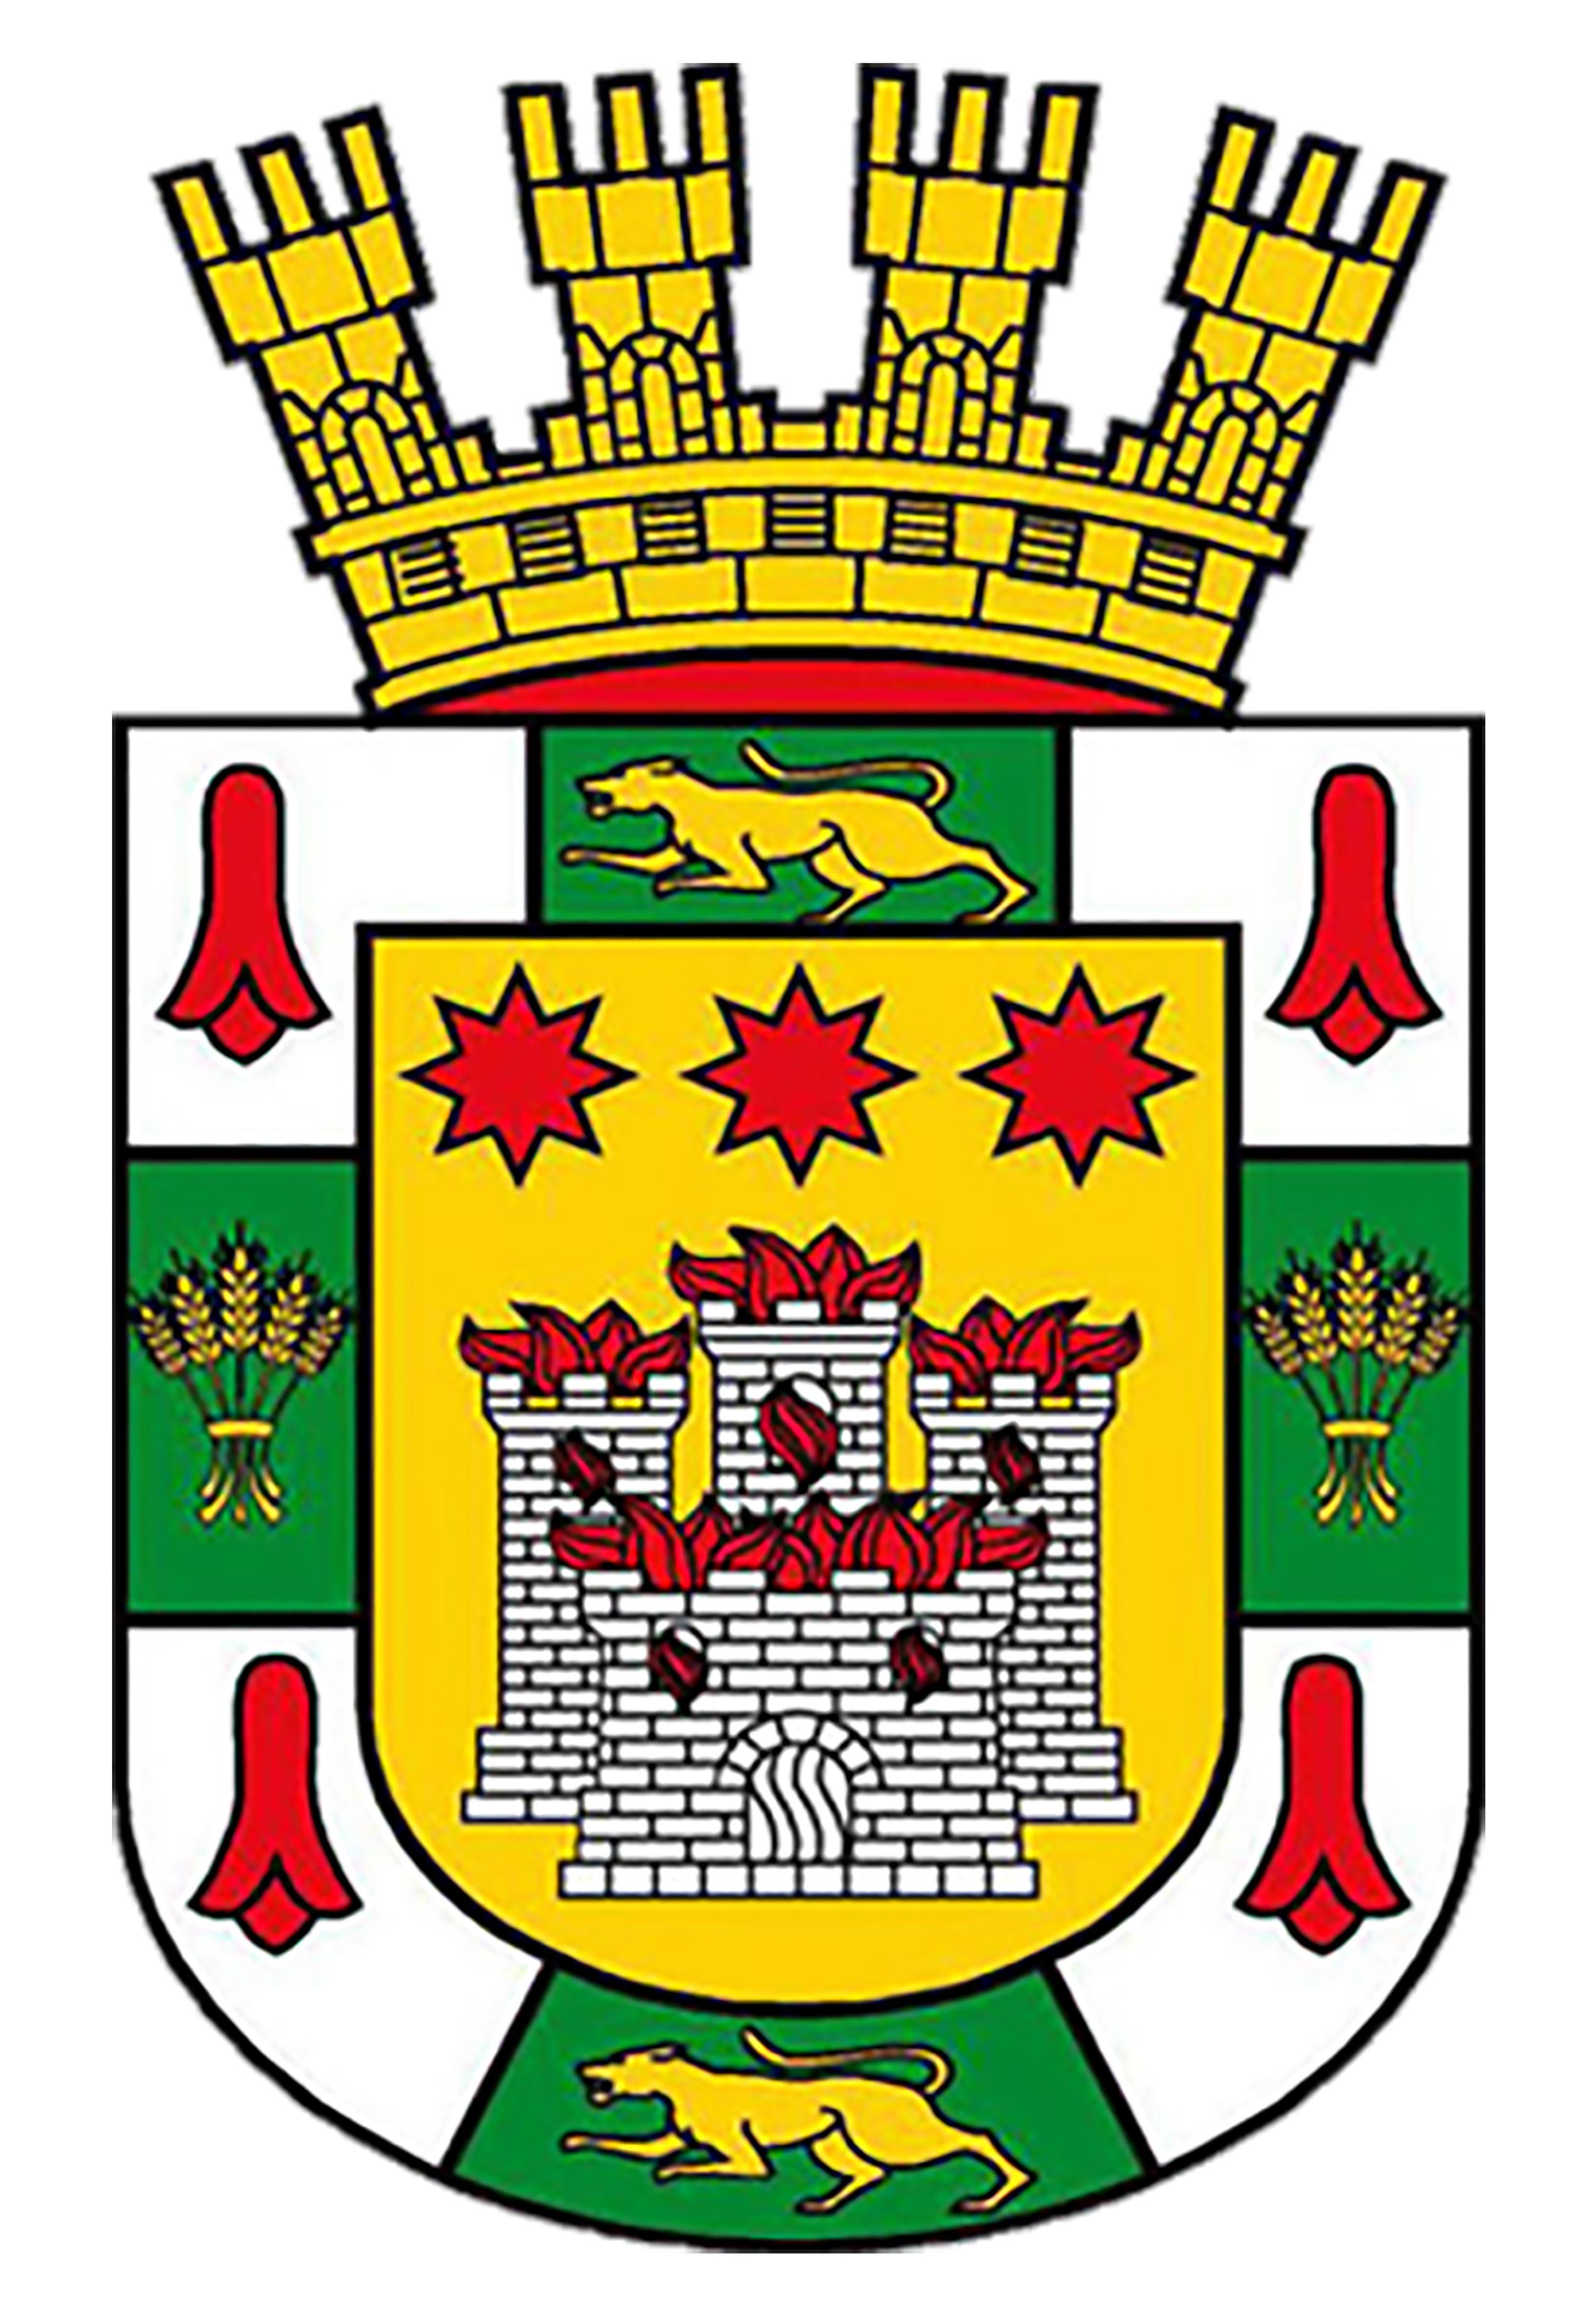 municipalidad_de_angol